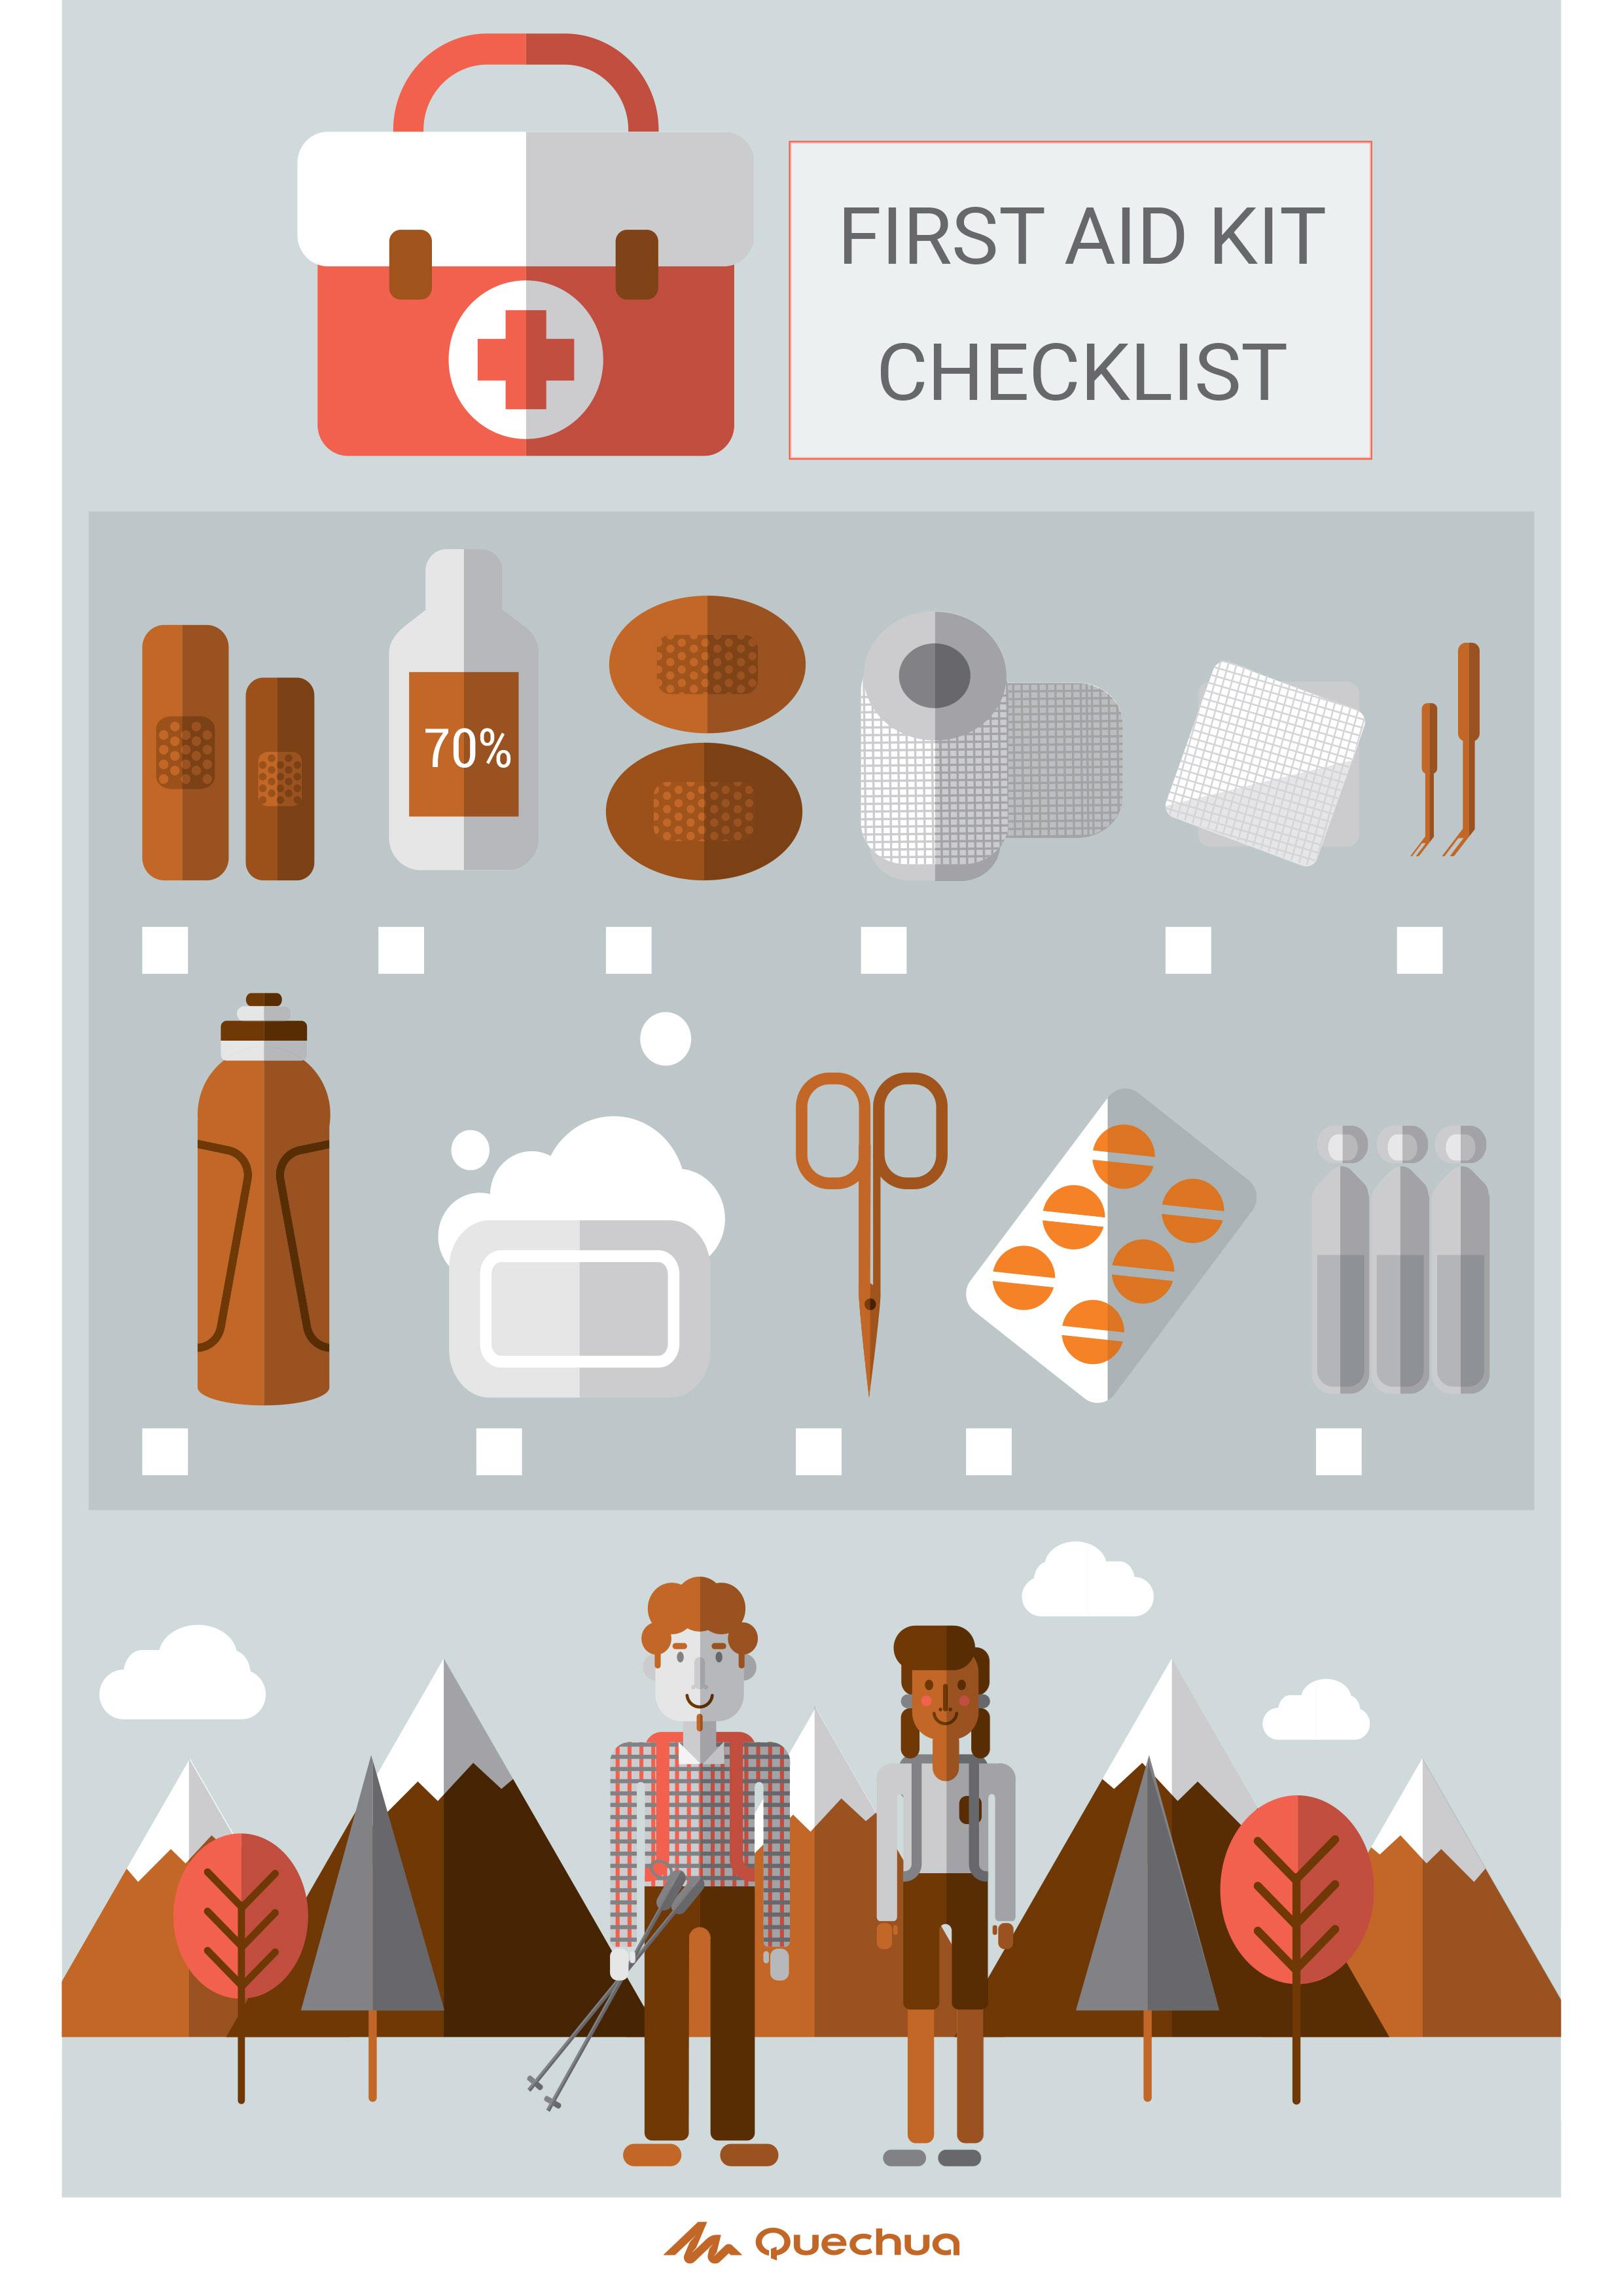 Quechua-first-aid-kit-checklist-hiking-hike --- Expires On 18-12-2023.jpg